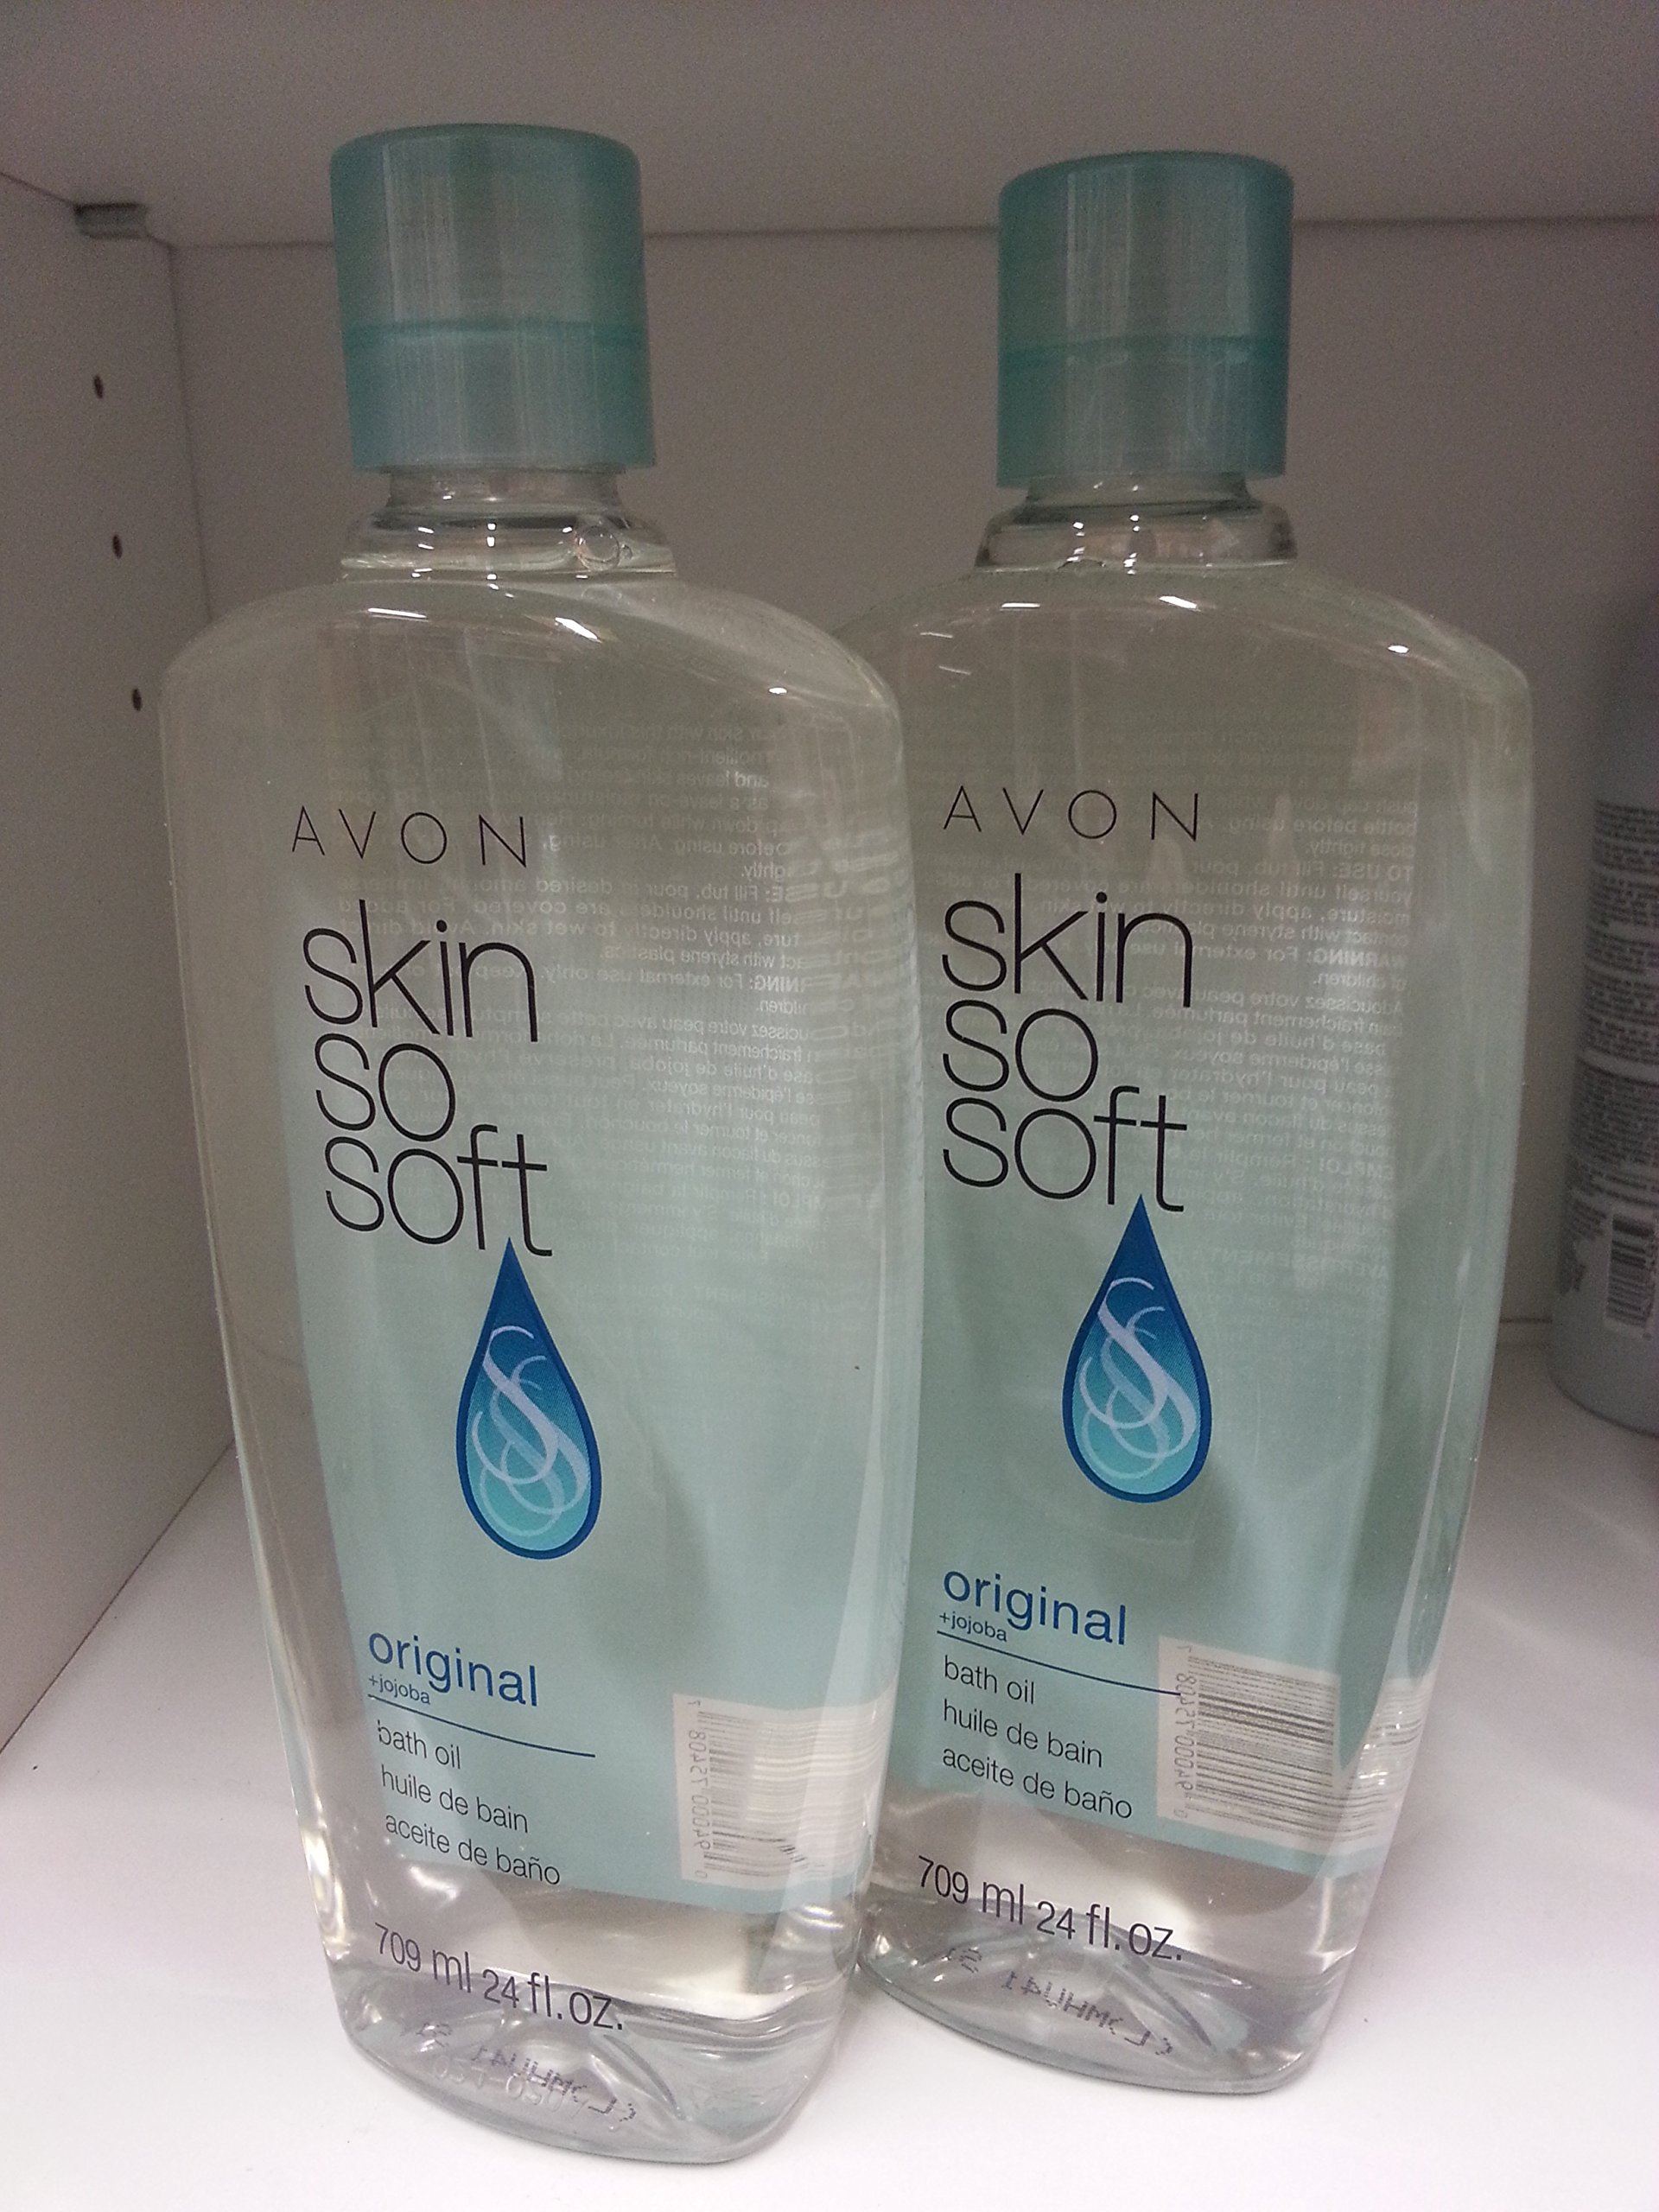 Lot of 6 Avon Sss Skin so Soft Bath Oil Original 24 Oz New by